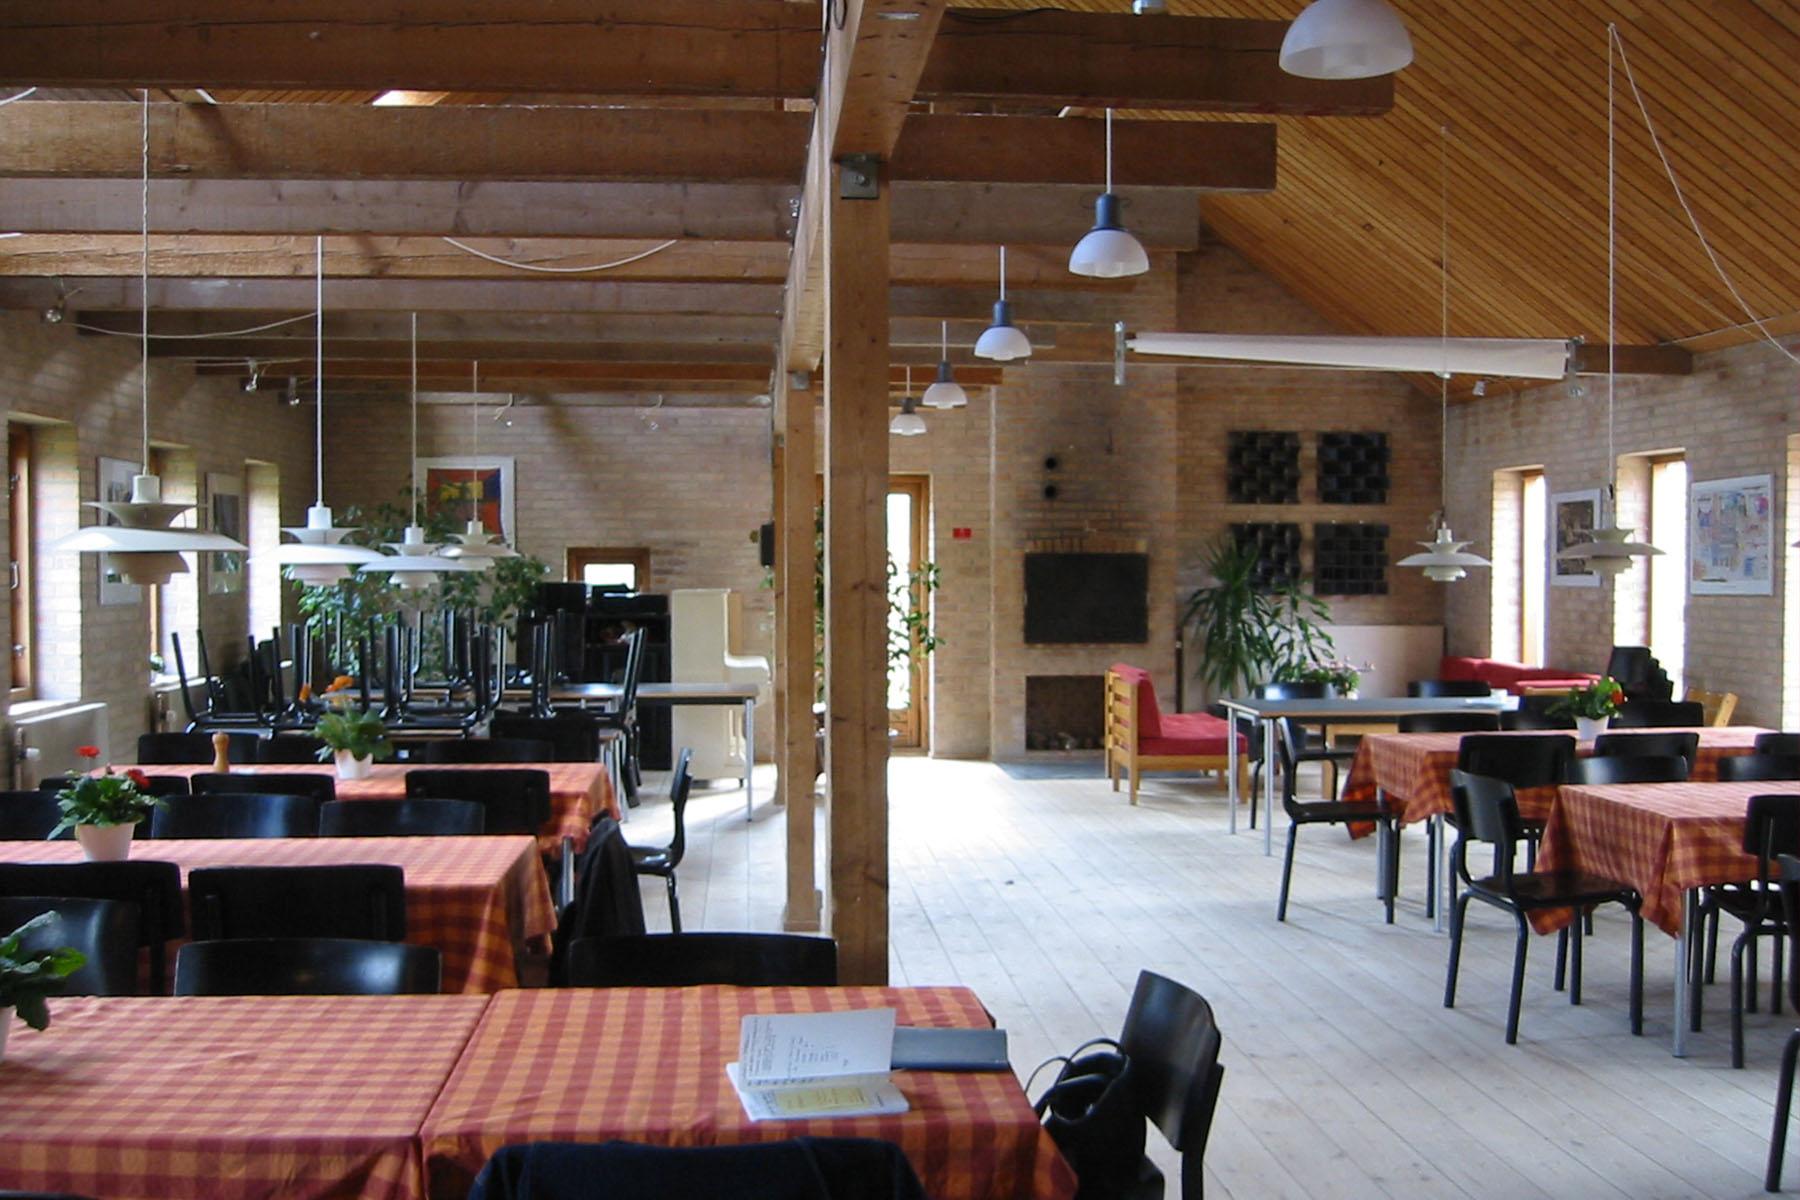 Bakken Cohousing  in Humlebaek, DK. Designed by Tegnestuen Vandkunsten